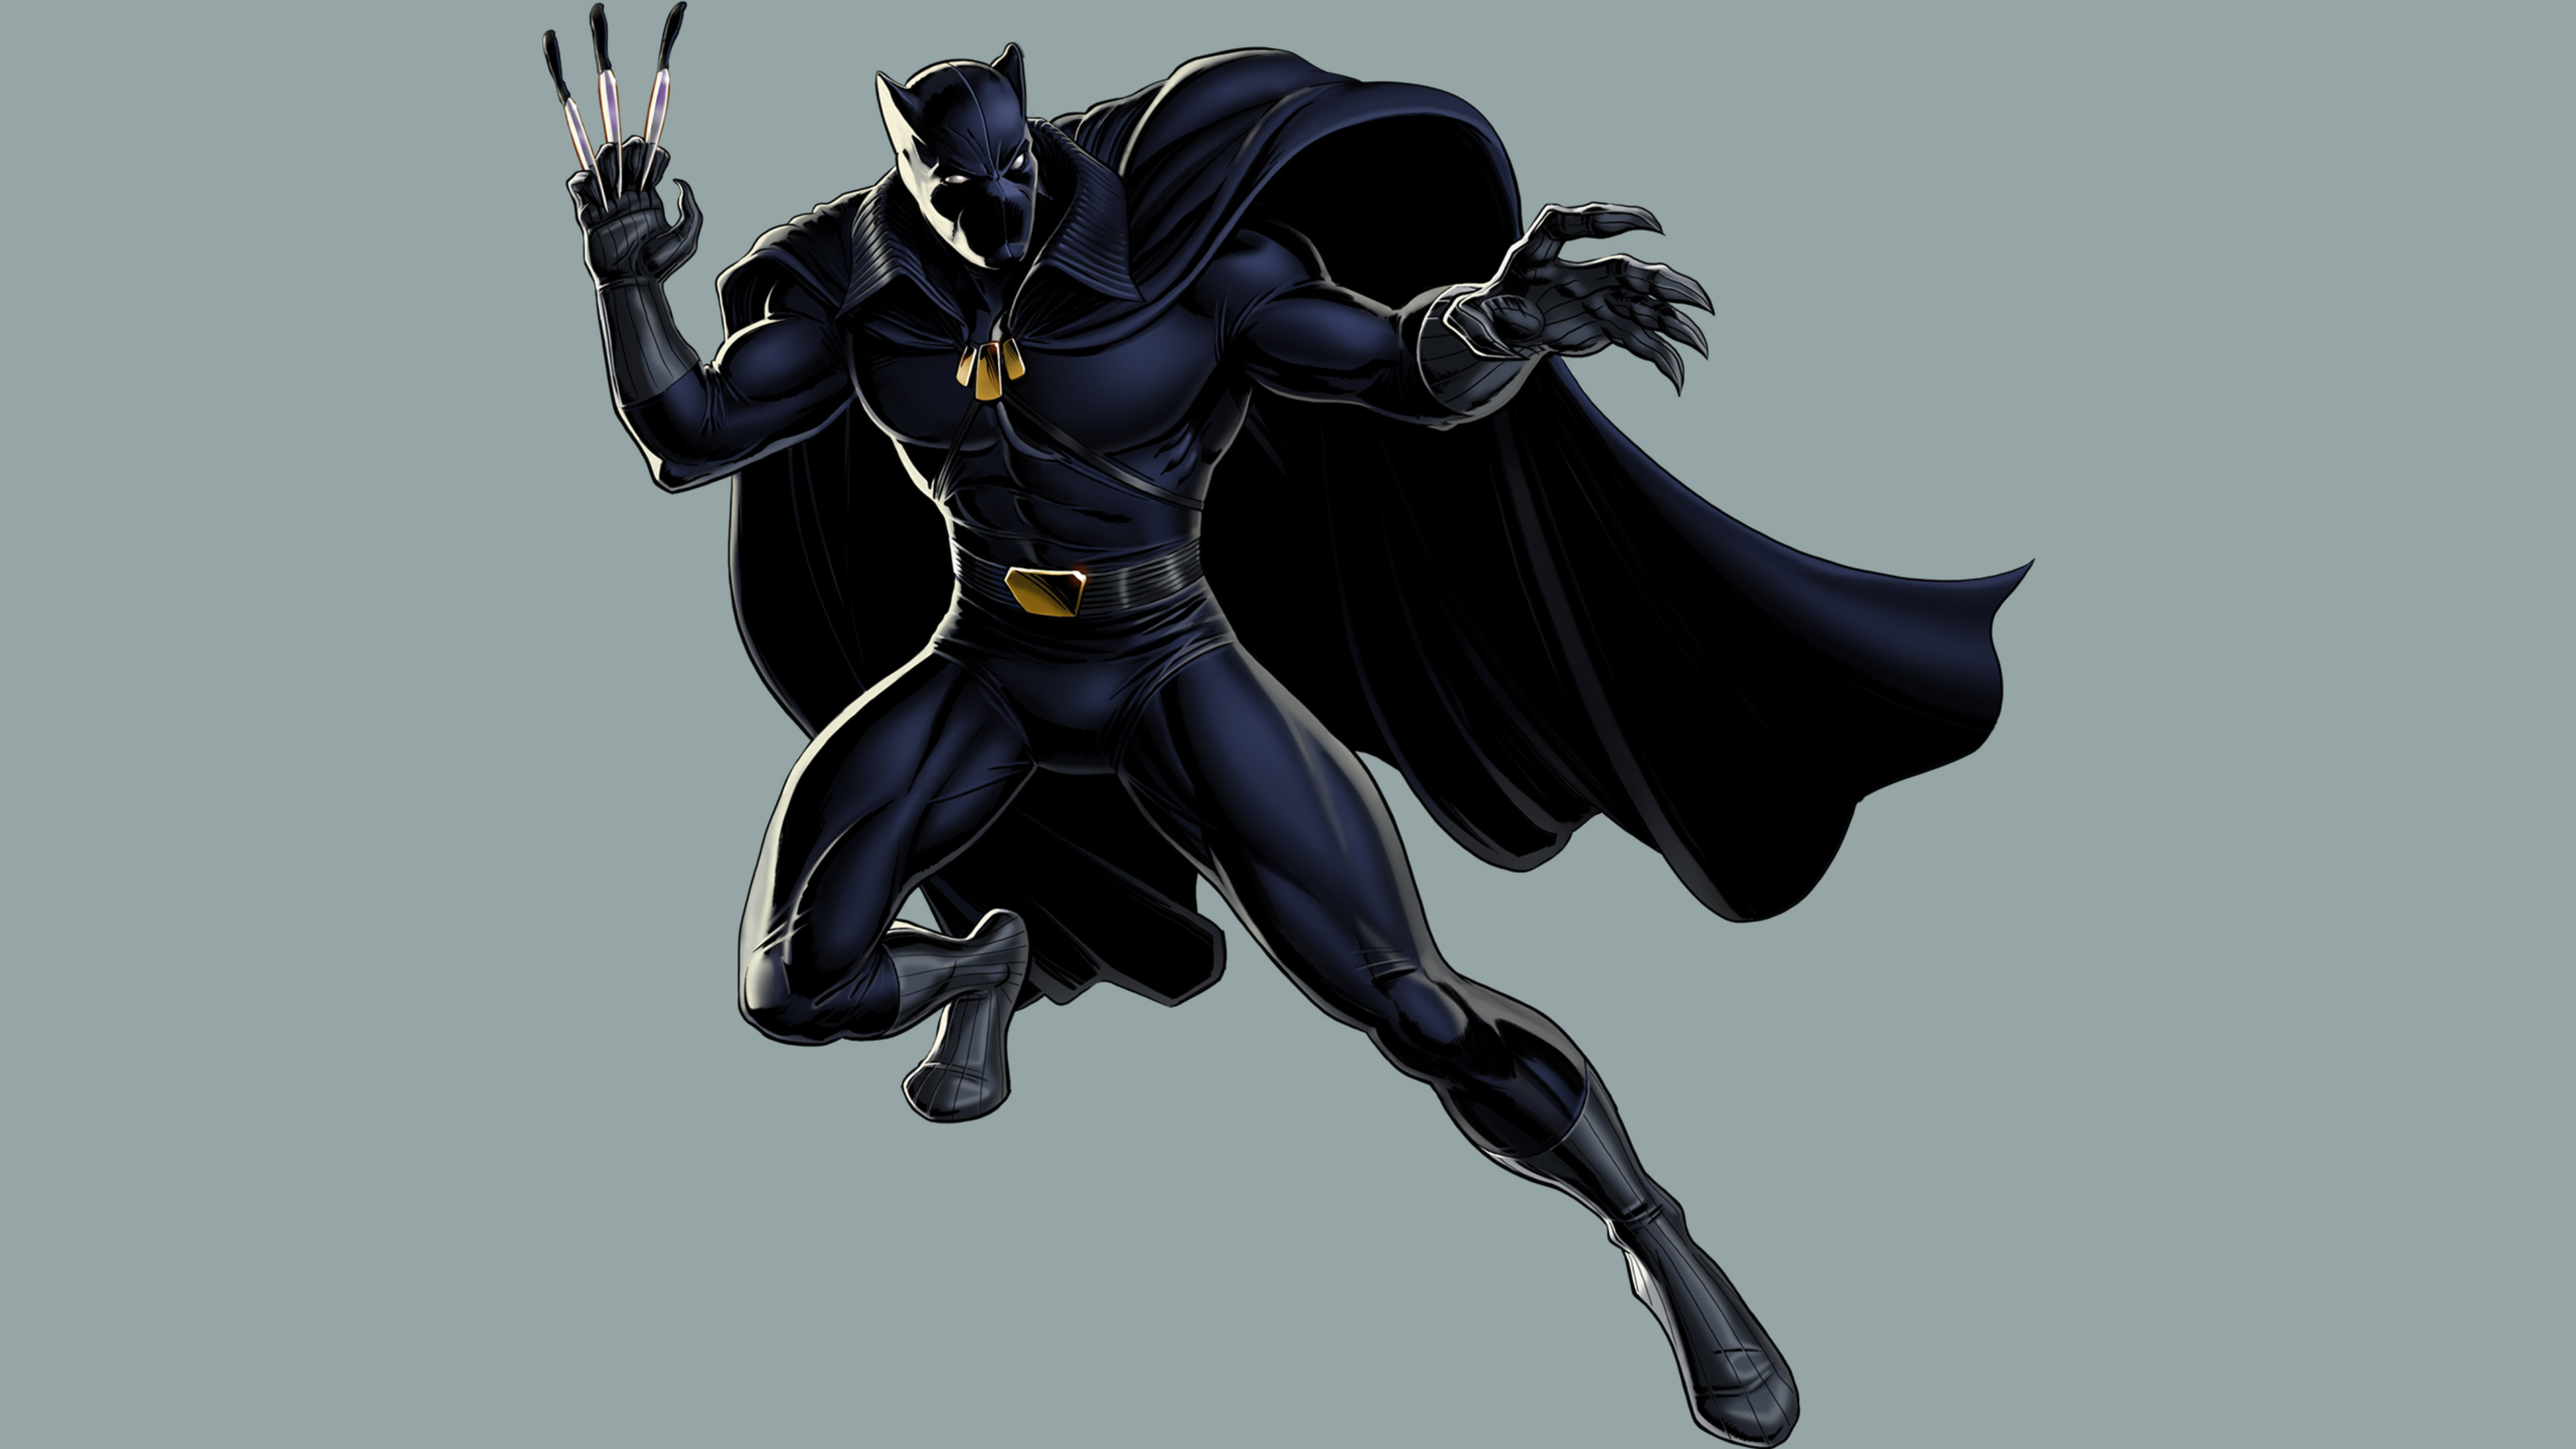 Black Panther Fictional Superhero 2, HD Superheroes, 4k ...